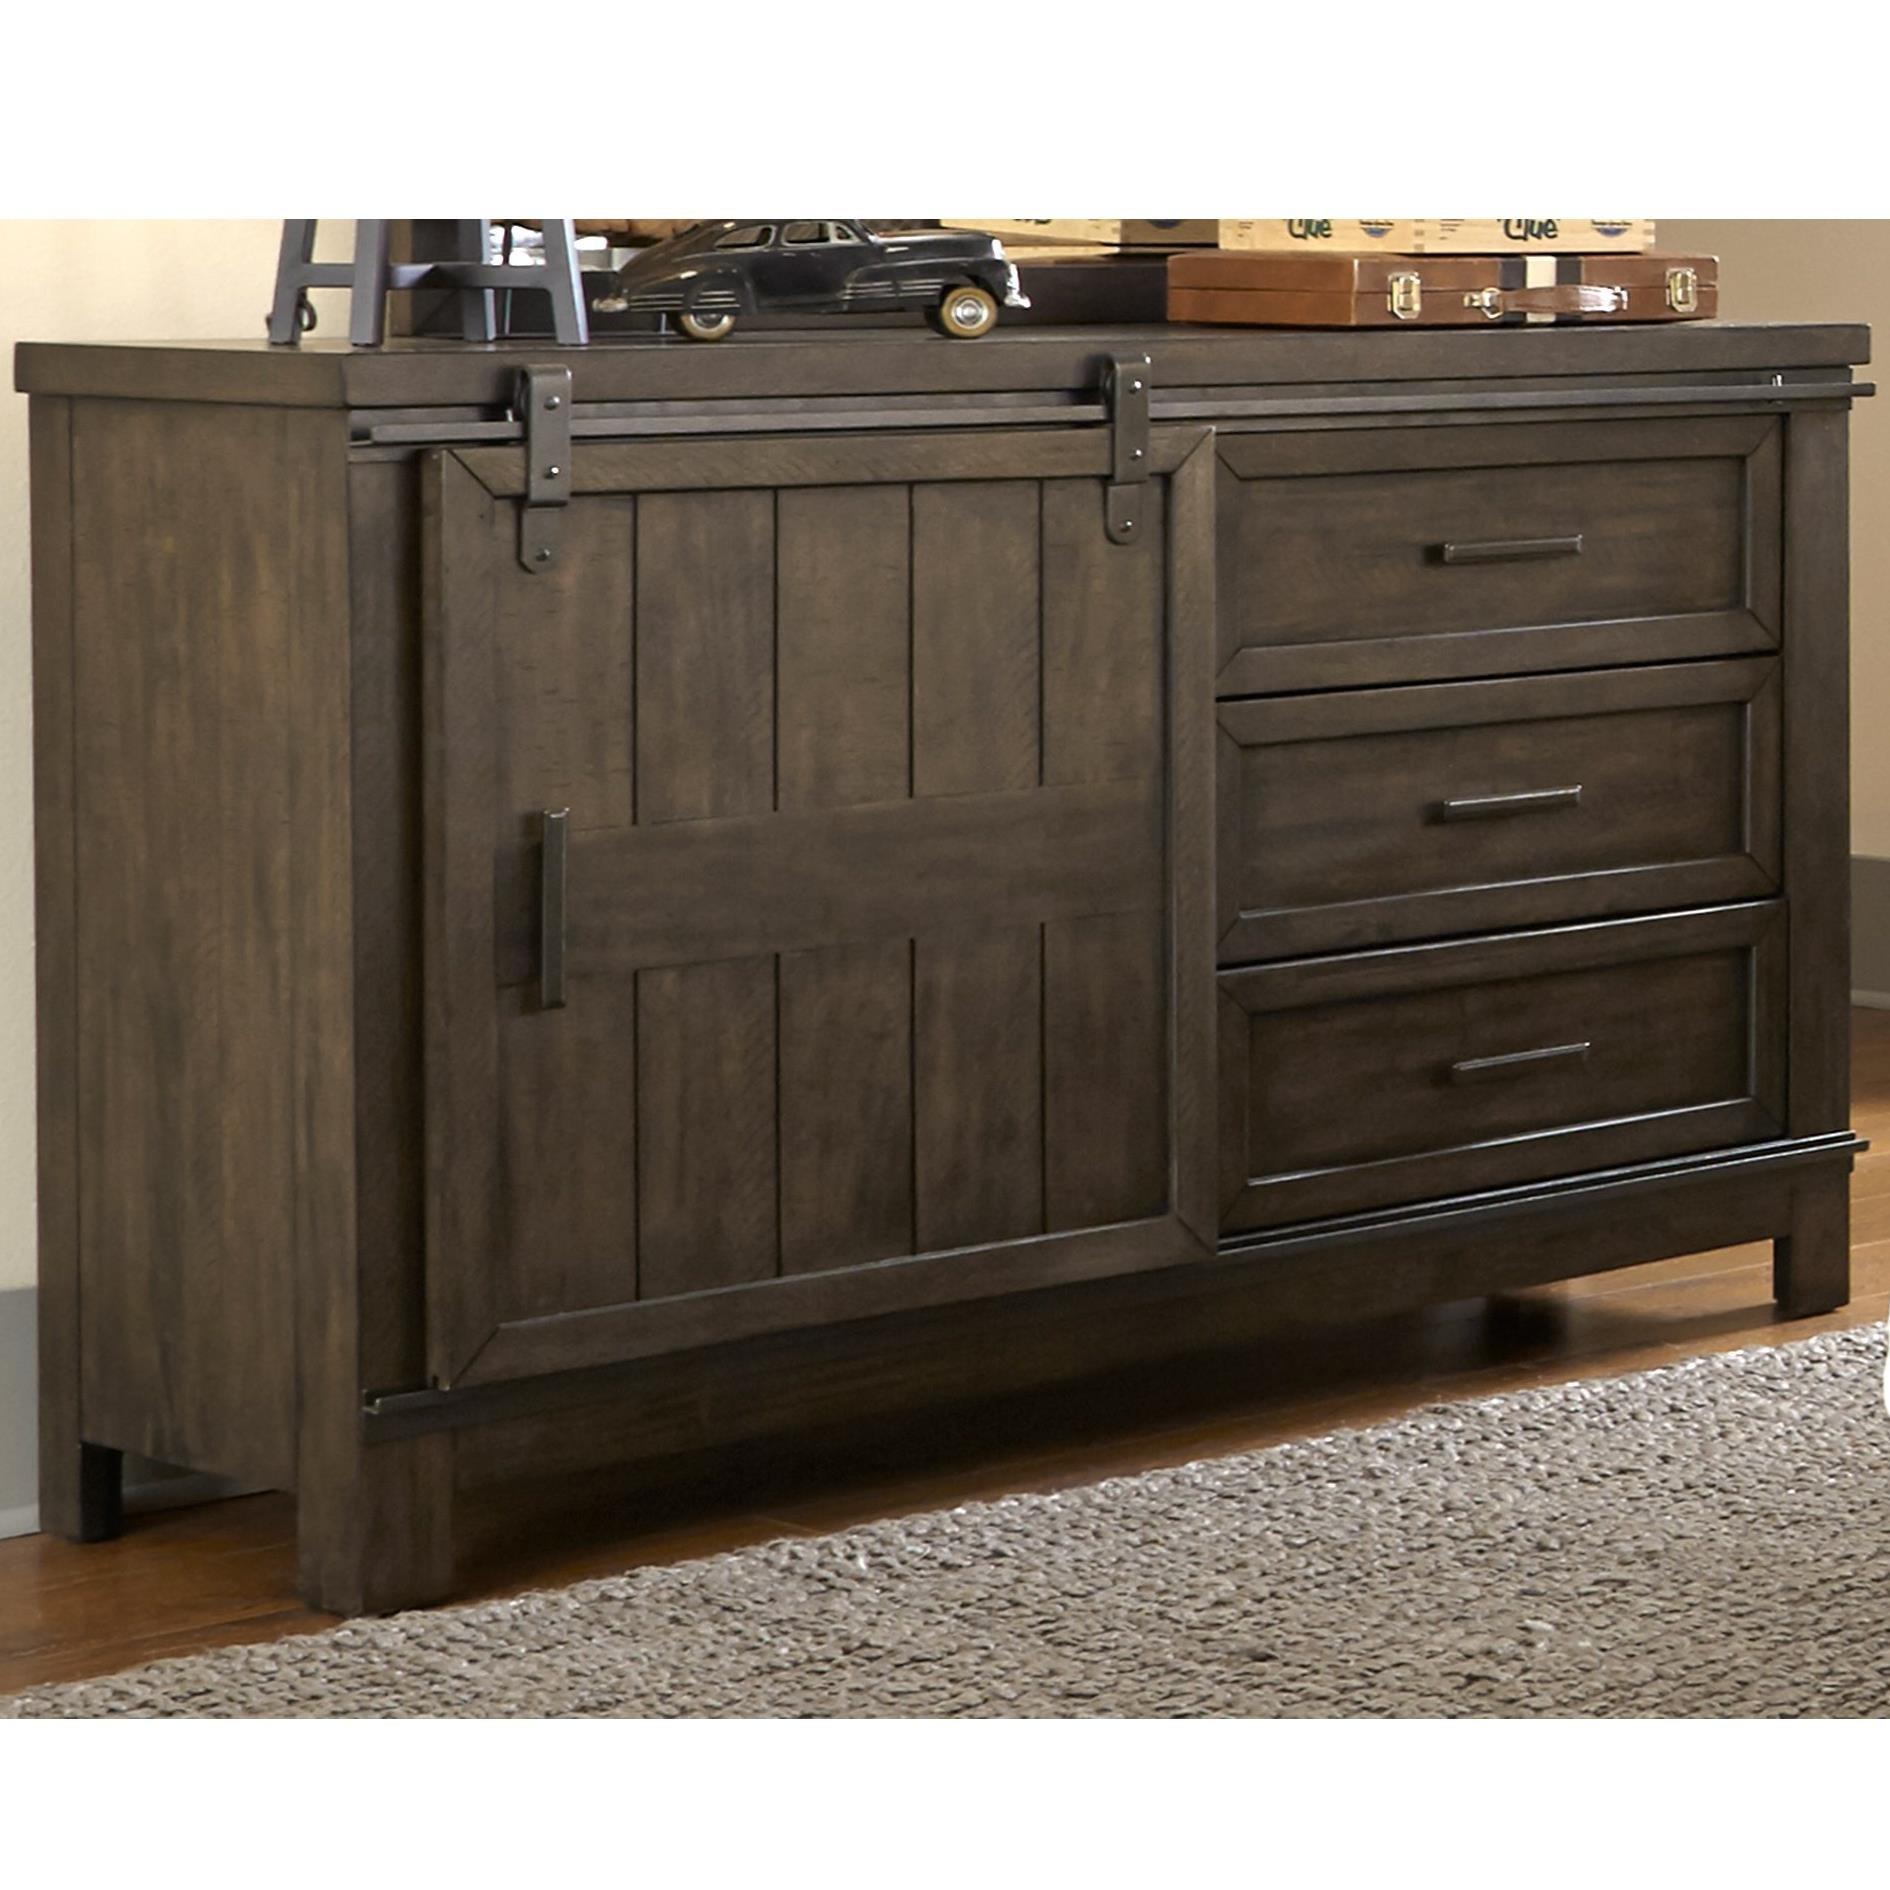 Thornwood Hills Dresser by Libby at Walker's Furniture